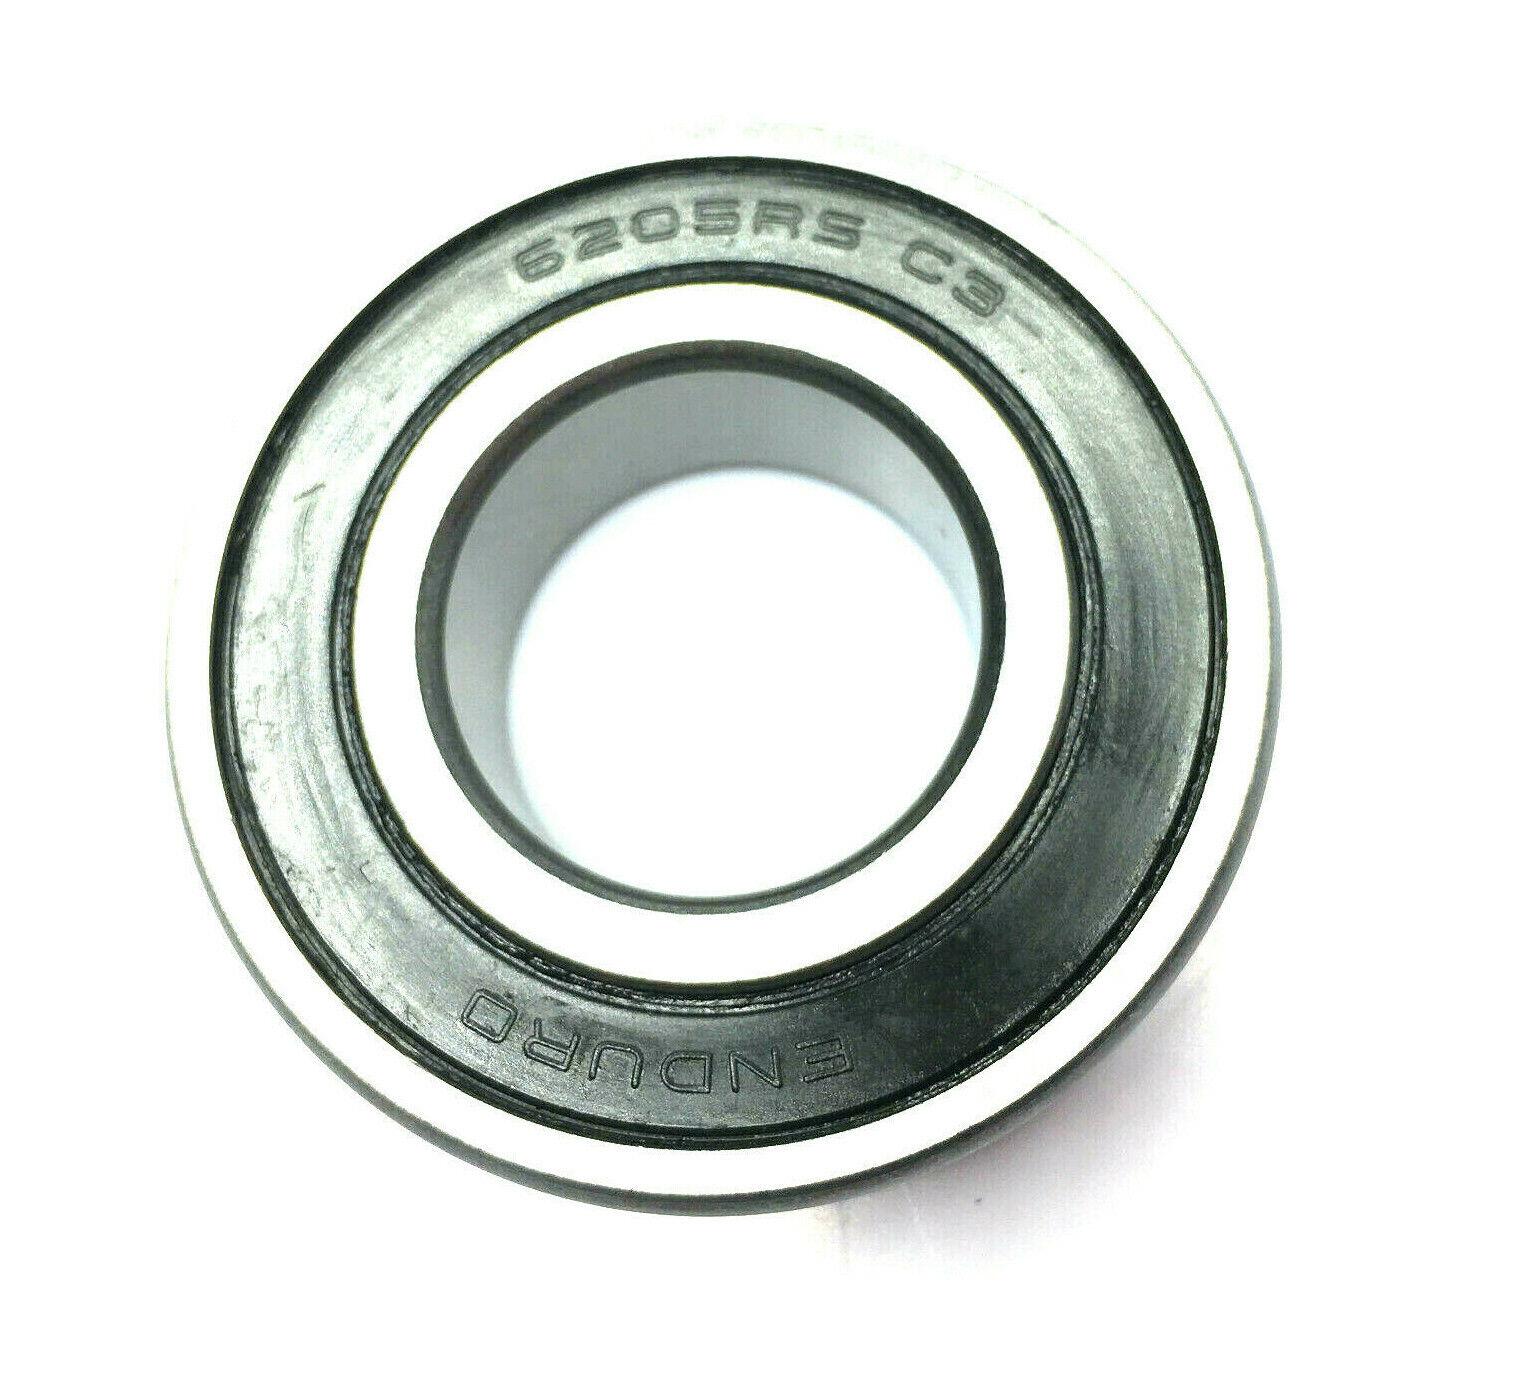 8 Sealed Radial Ball Bearing 6205RS 25x52x15